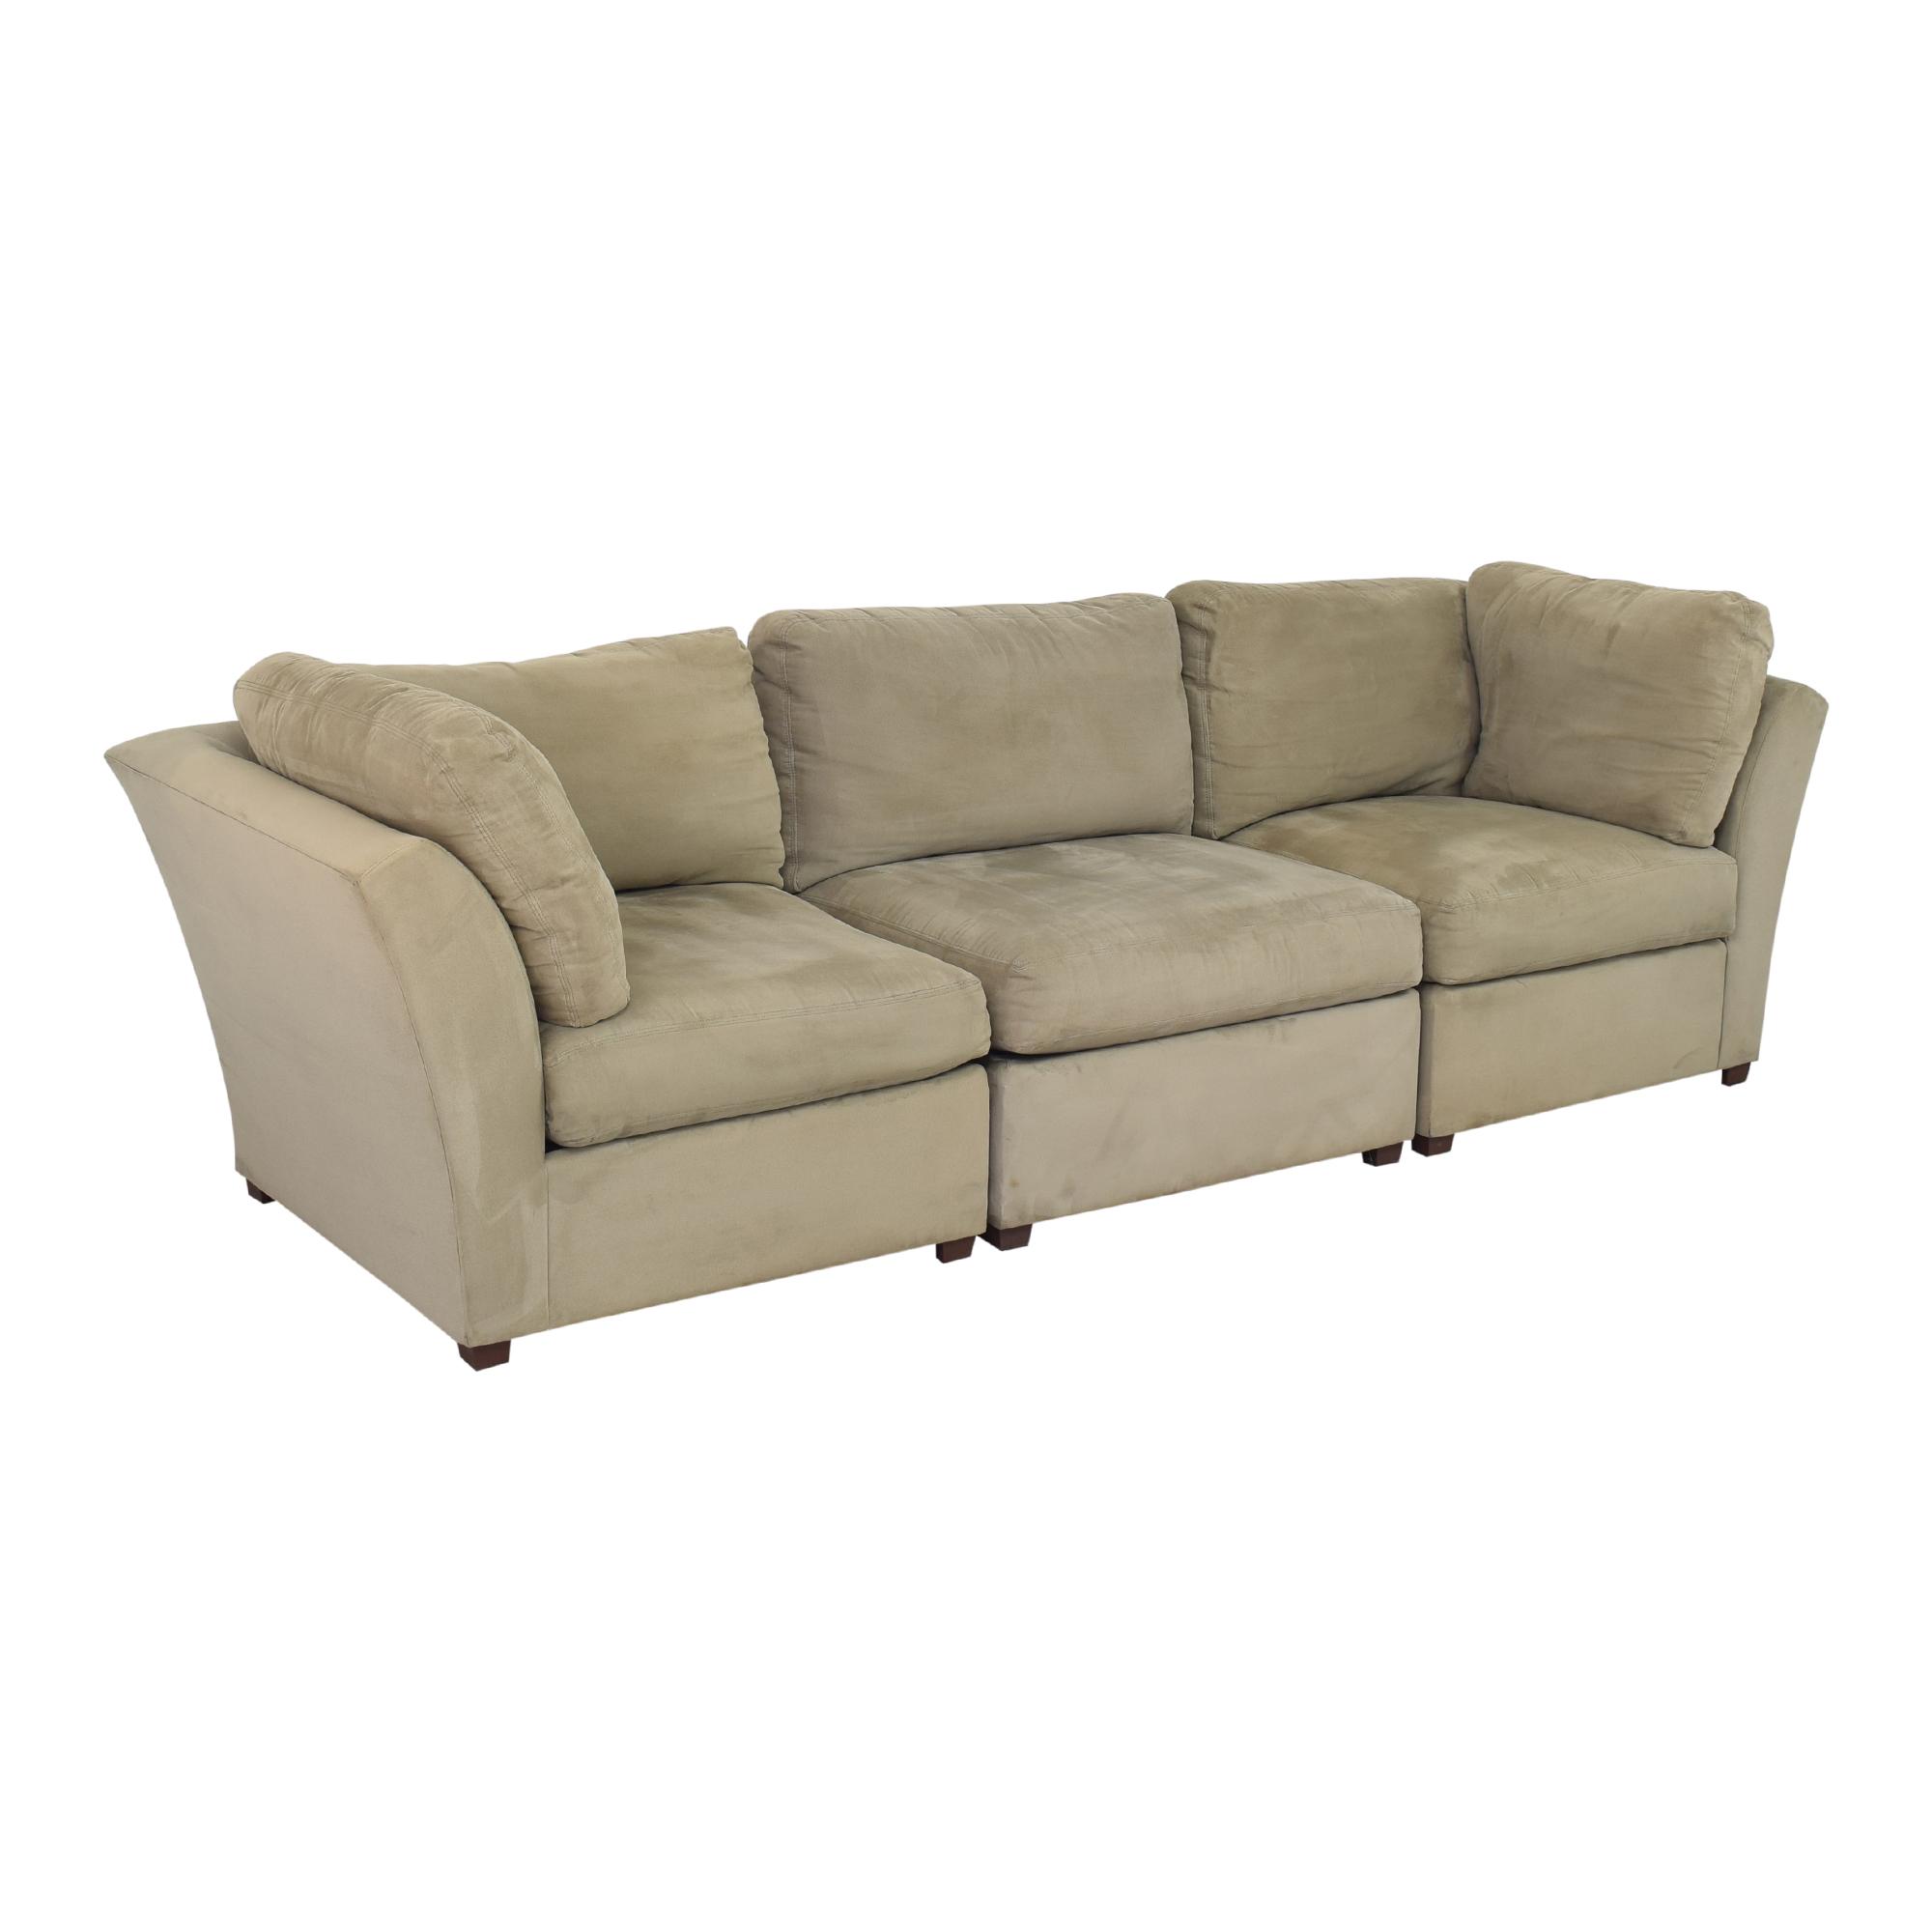 Raymour & Flanigan Raymour & Flanigan Modular Sofa Sofas